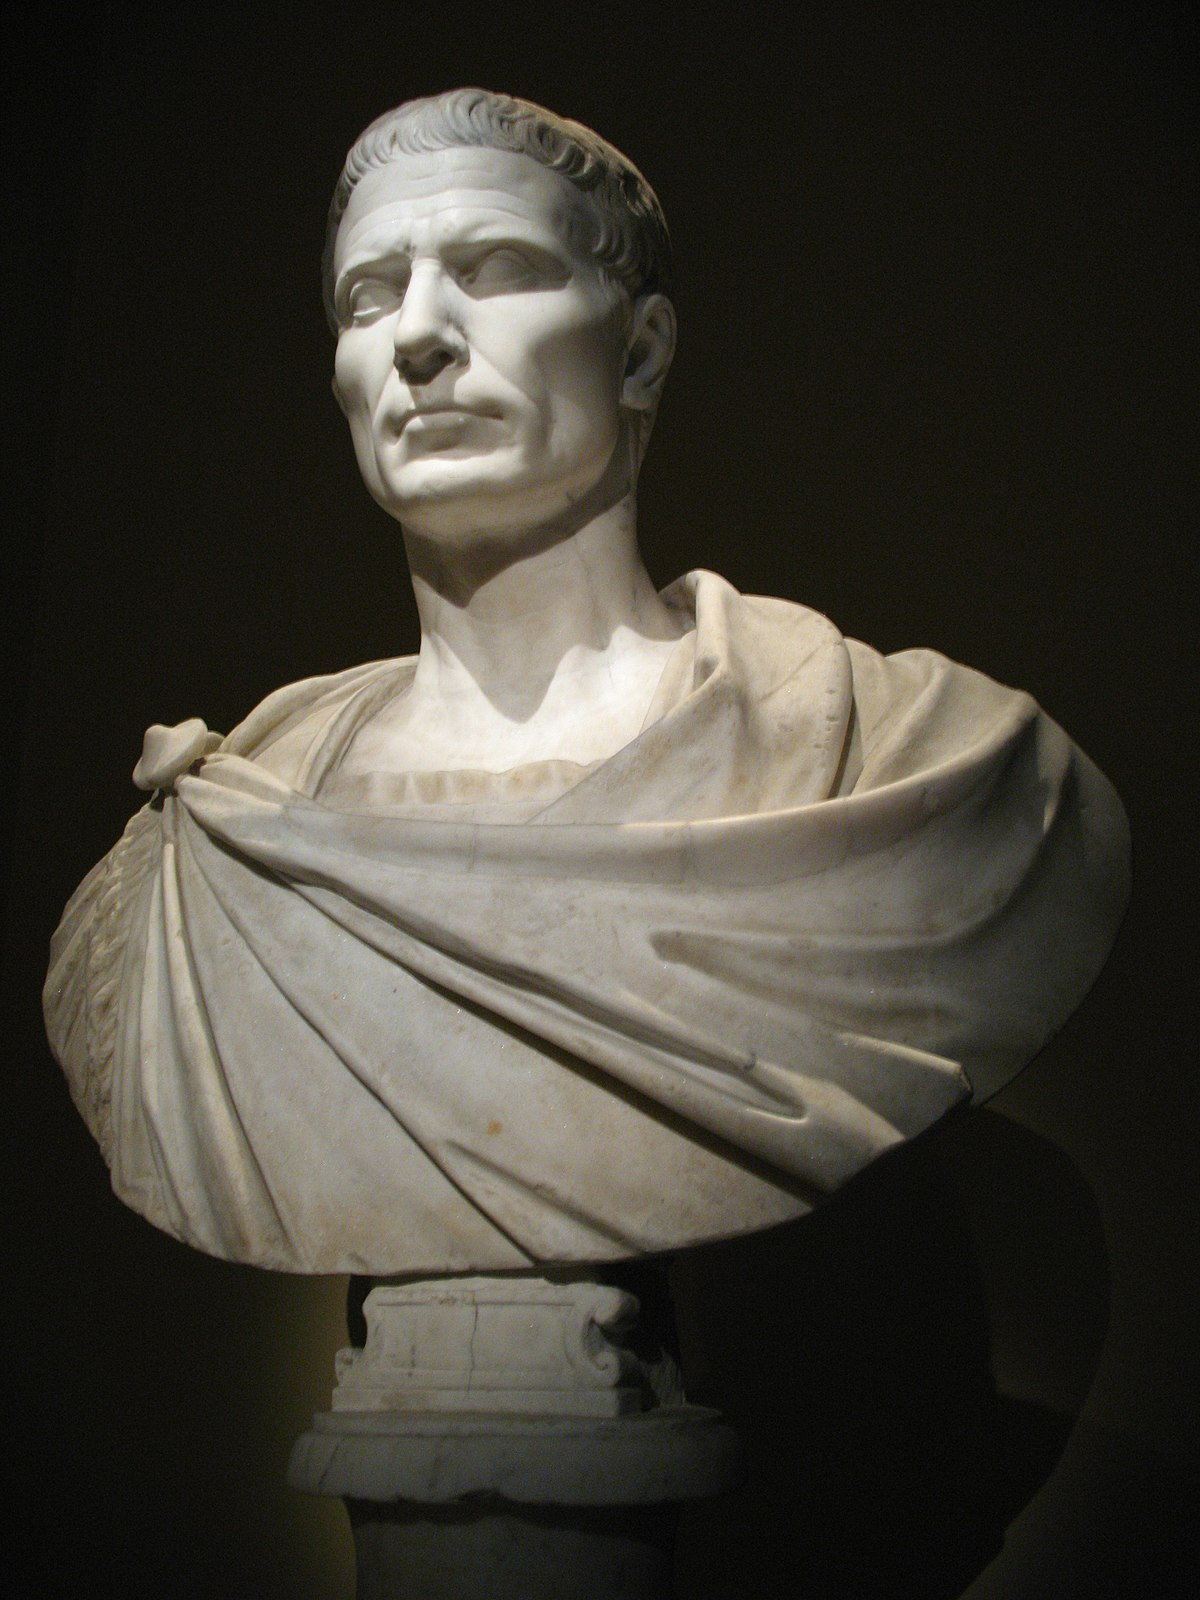 Aug 21, · Julius Caesar. The statesman and general Julius Caesar ( B.C.) expanded the Roman Republic through a series of battles across Europe before declaring himself dictator for life.